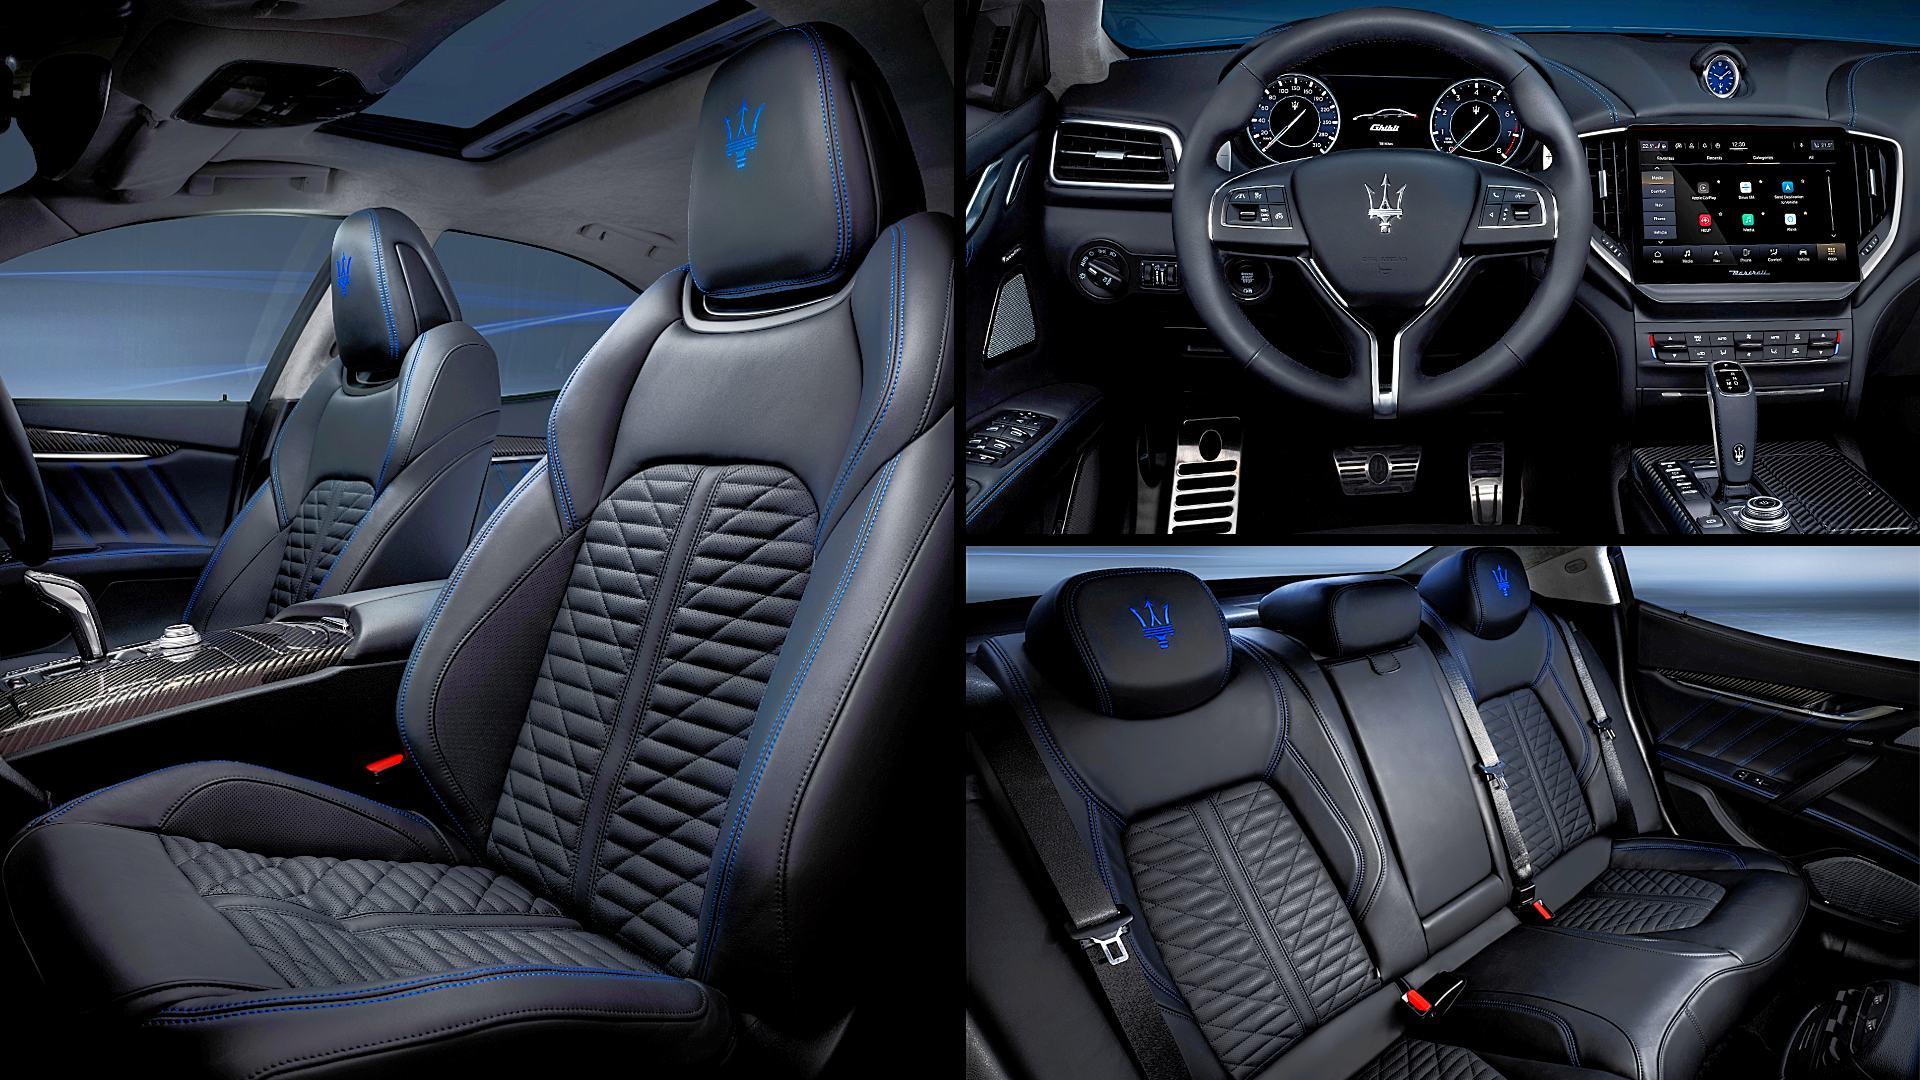 2021 Maserati Ghibli Inside Interior Images